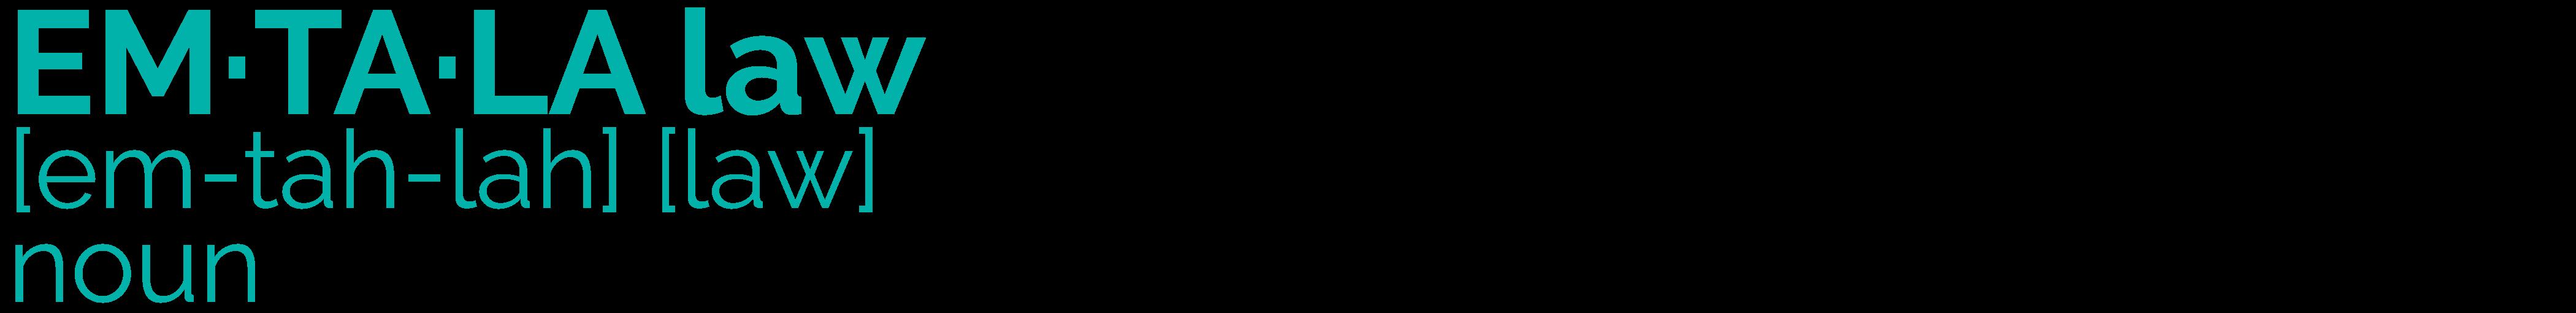 EMTLA